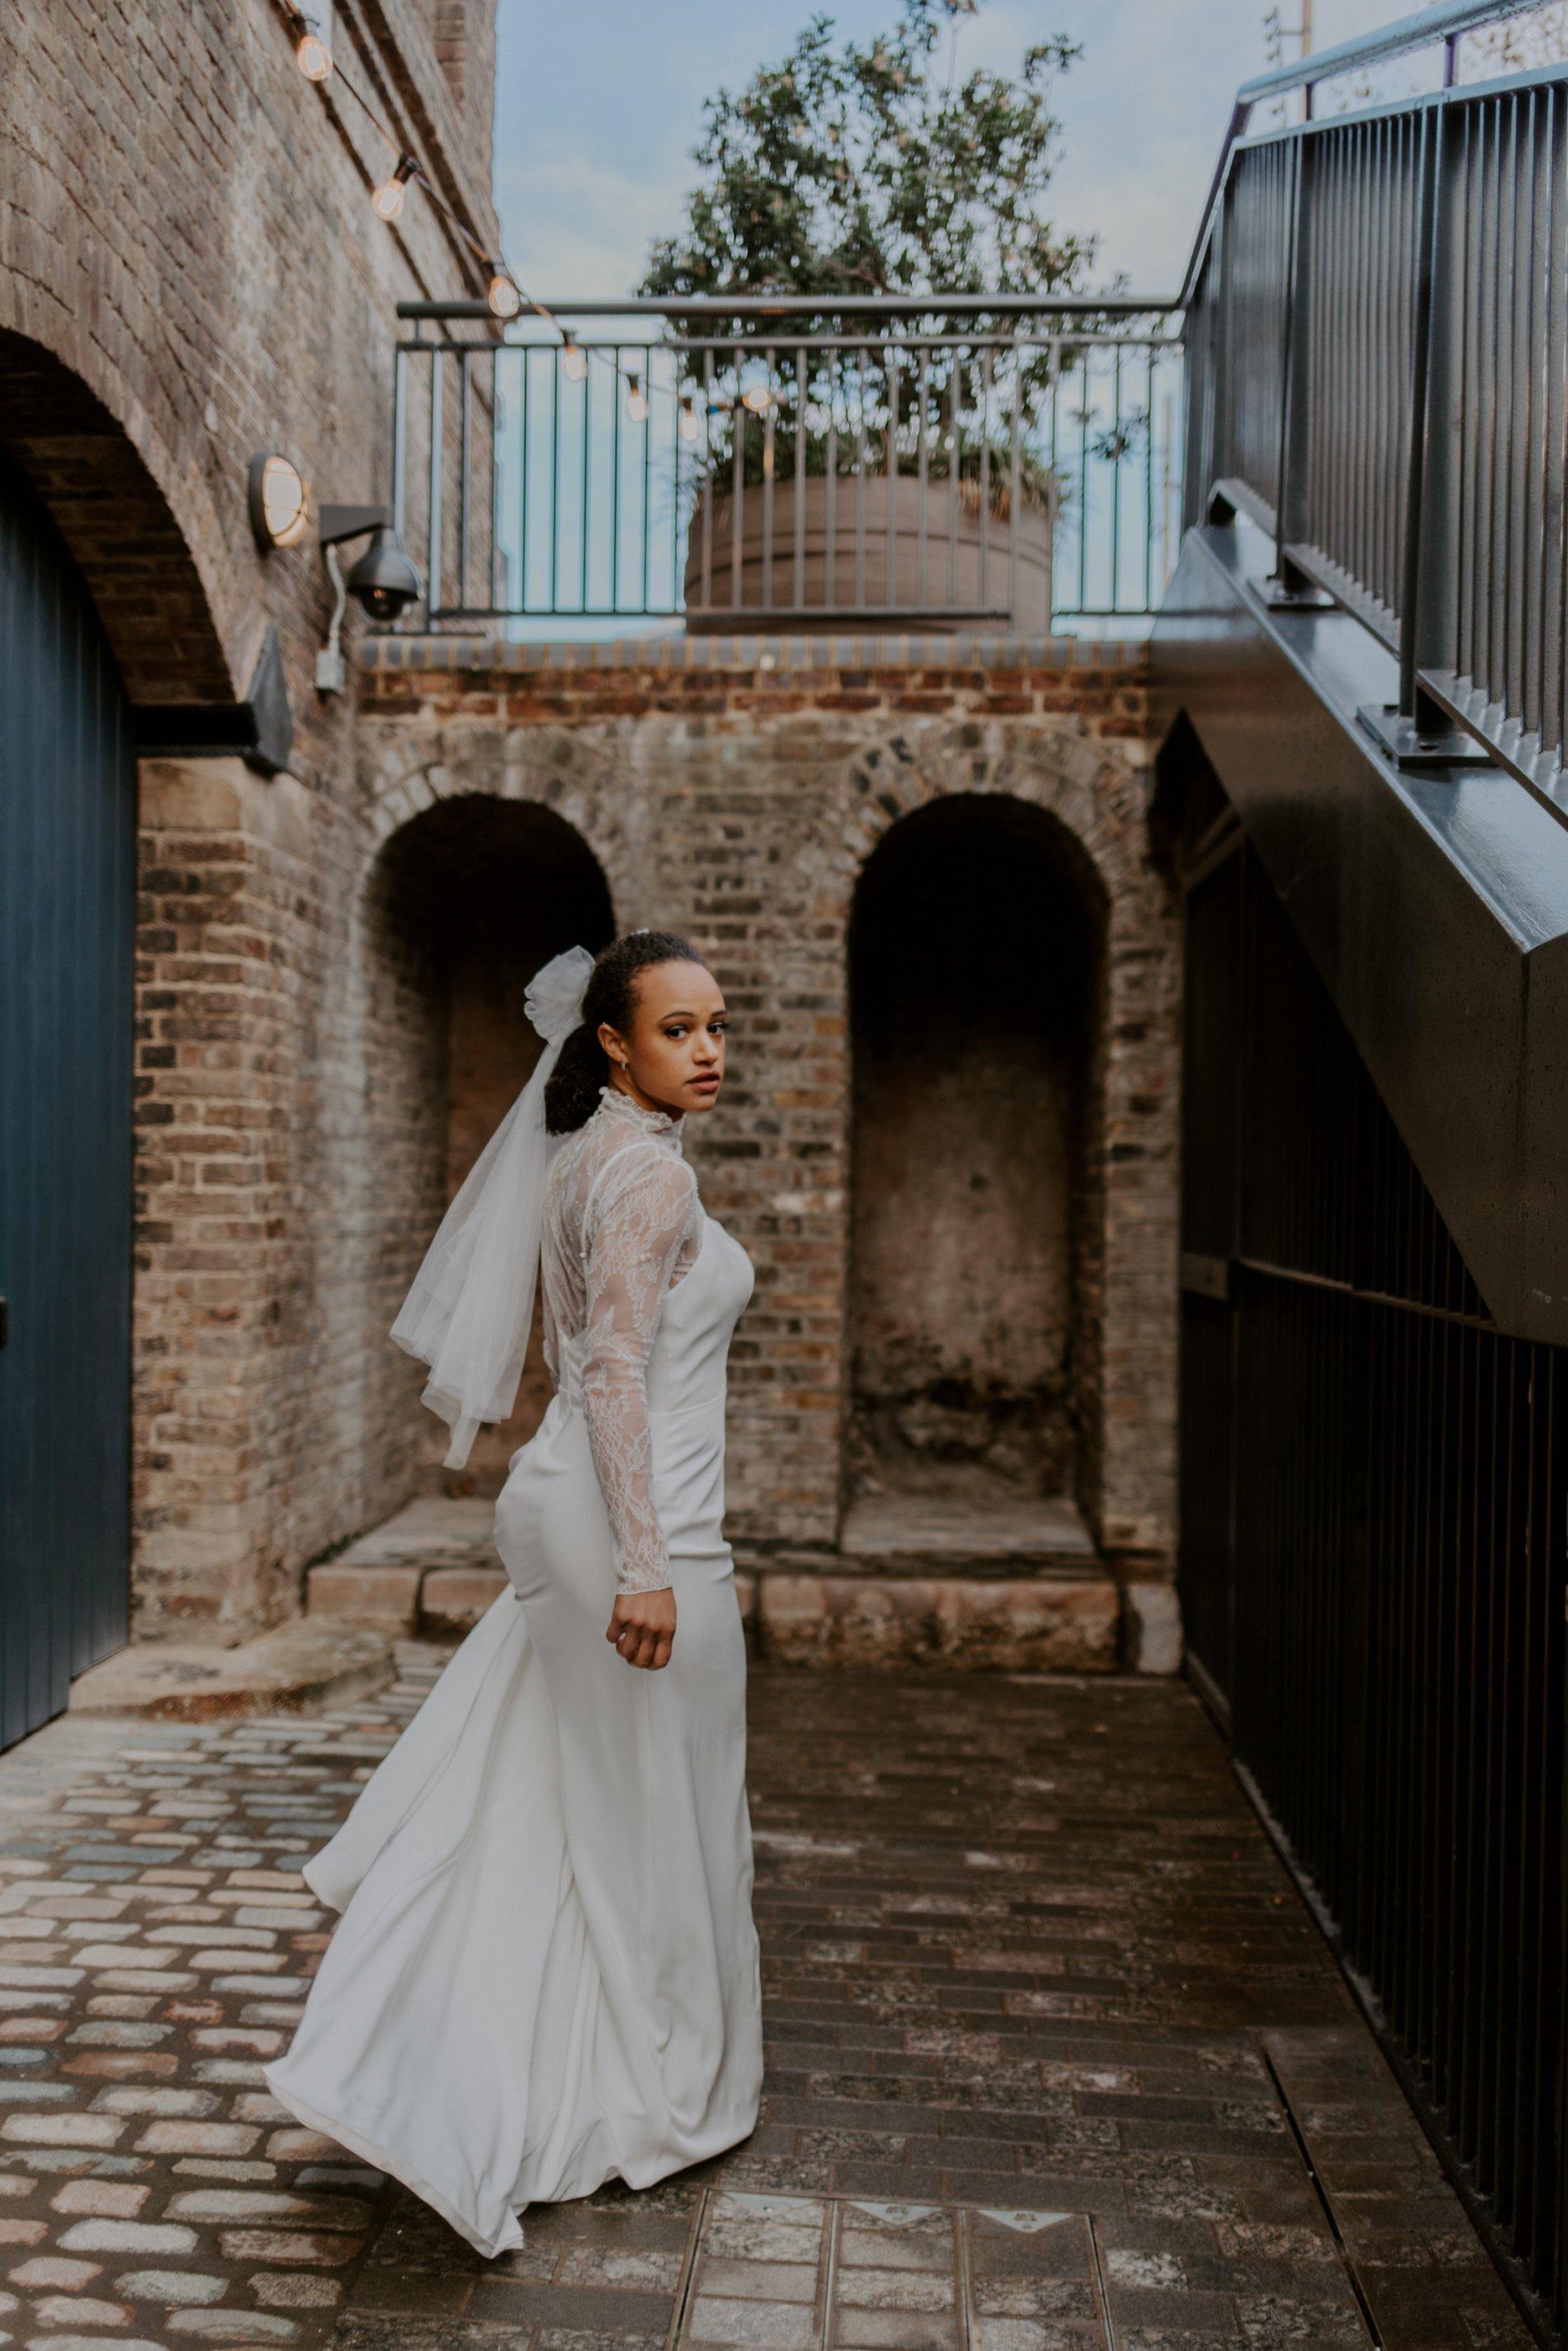 City Wedding Styled Shoot at Coal Drops Yard (c) Emztography (19)